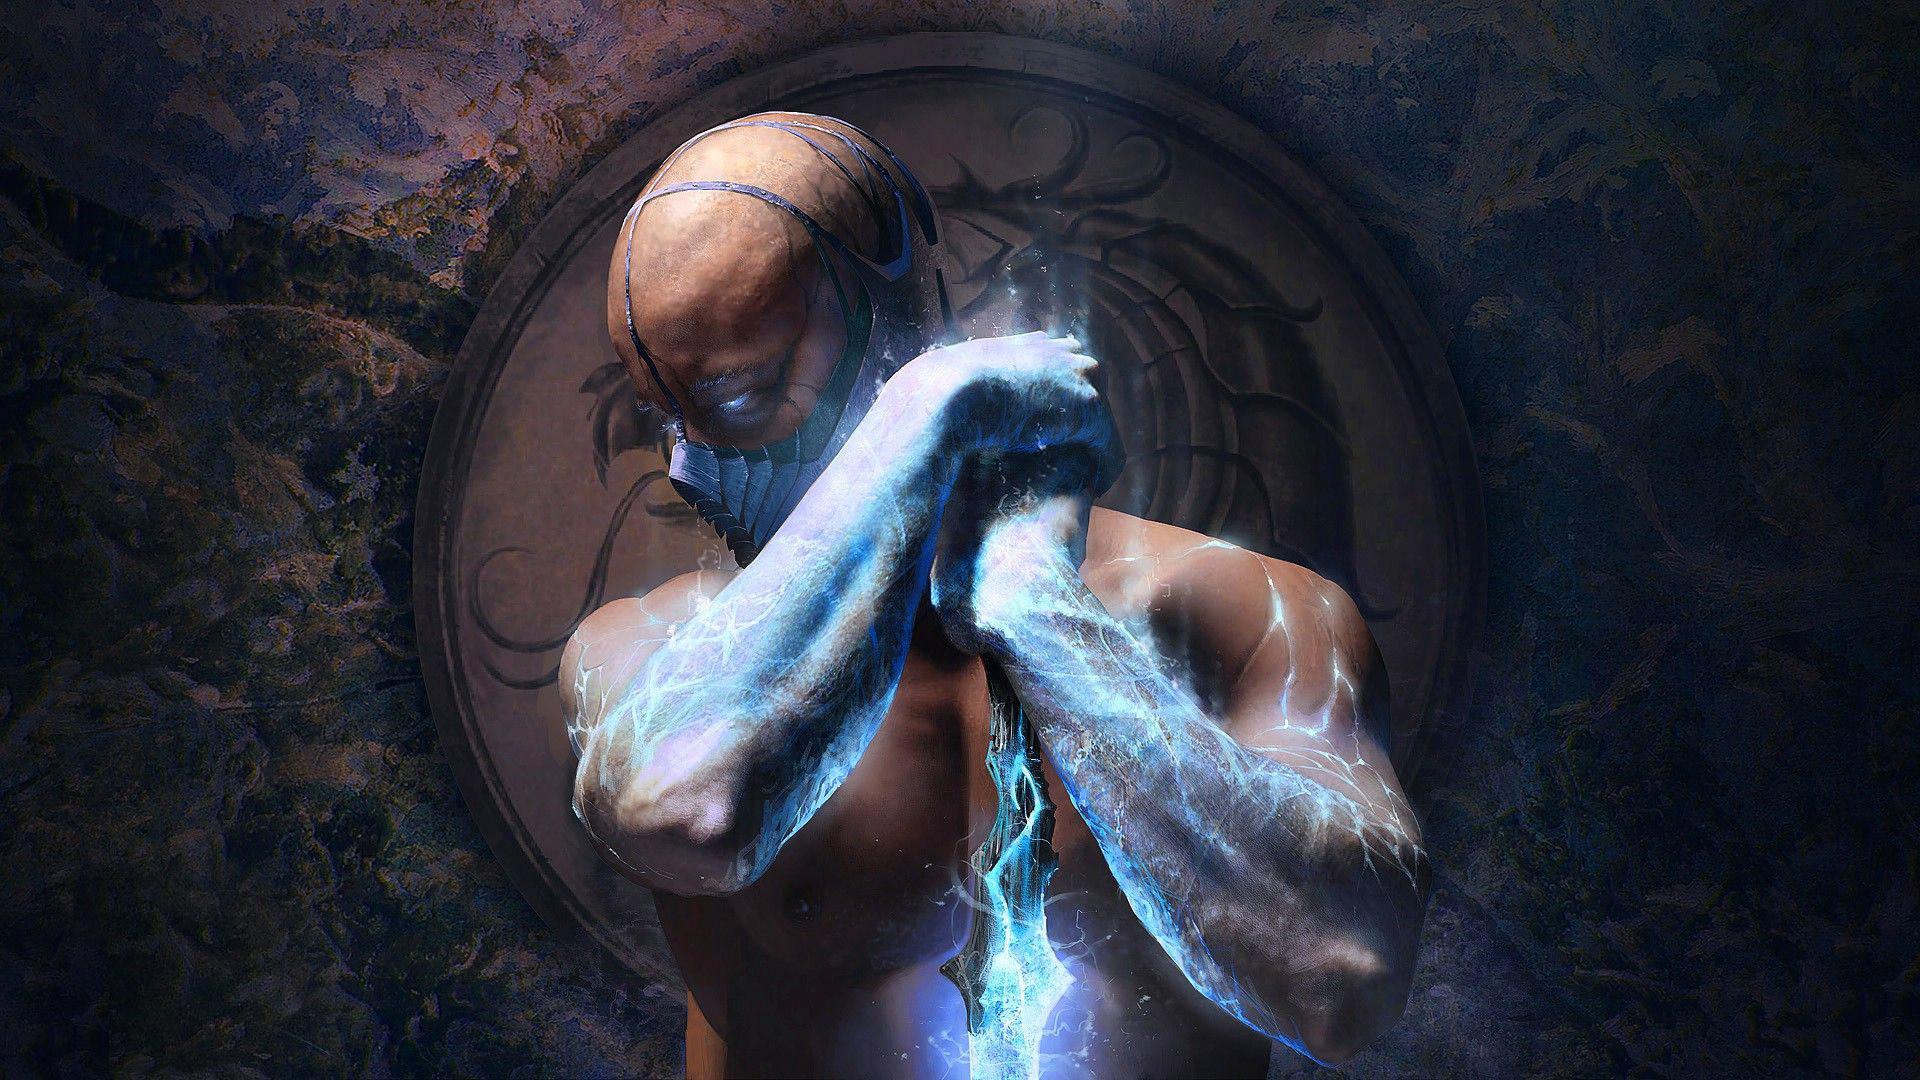 Sub-Zero – Mortal Kombat Wallpaper #7428